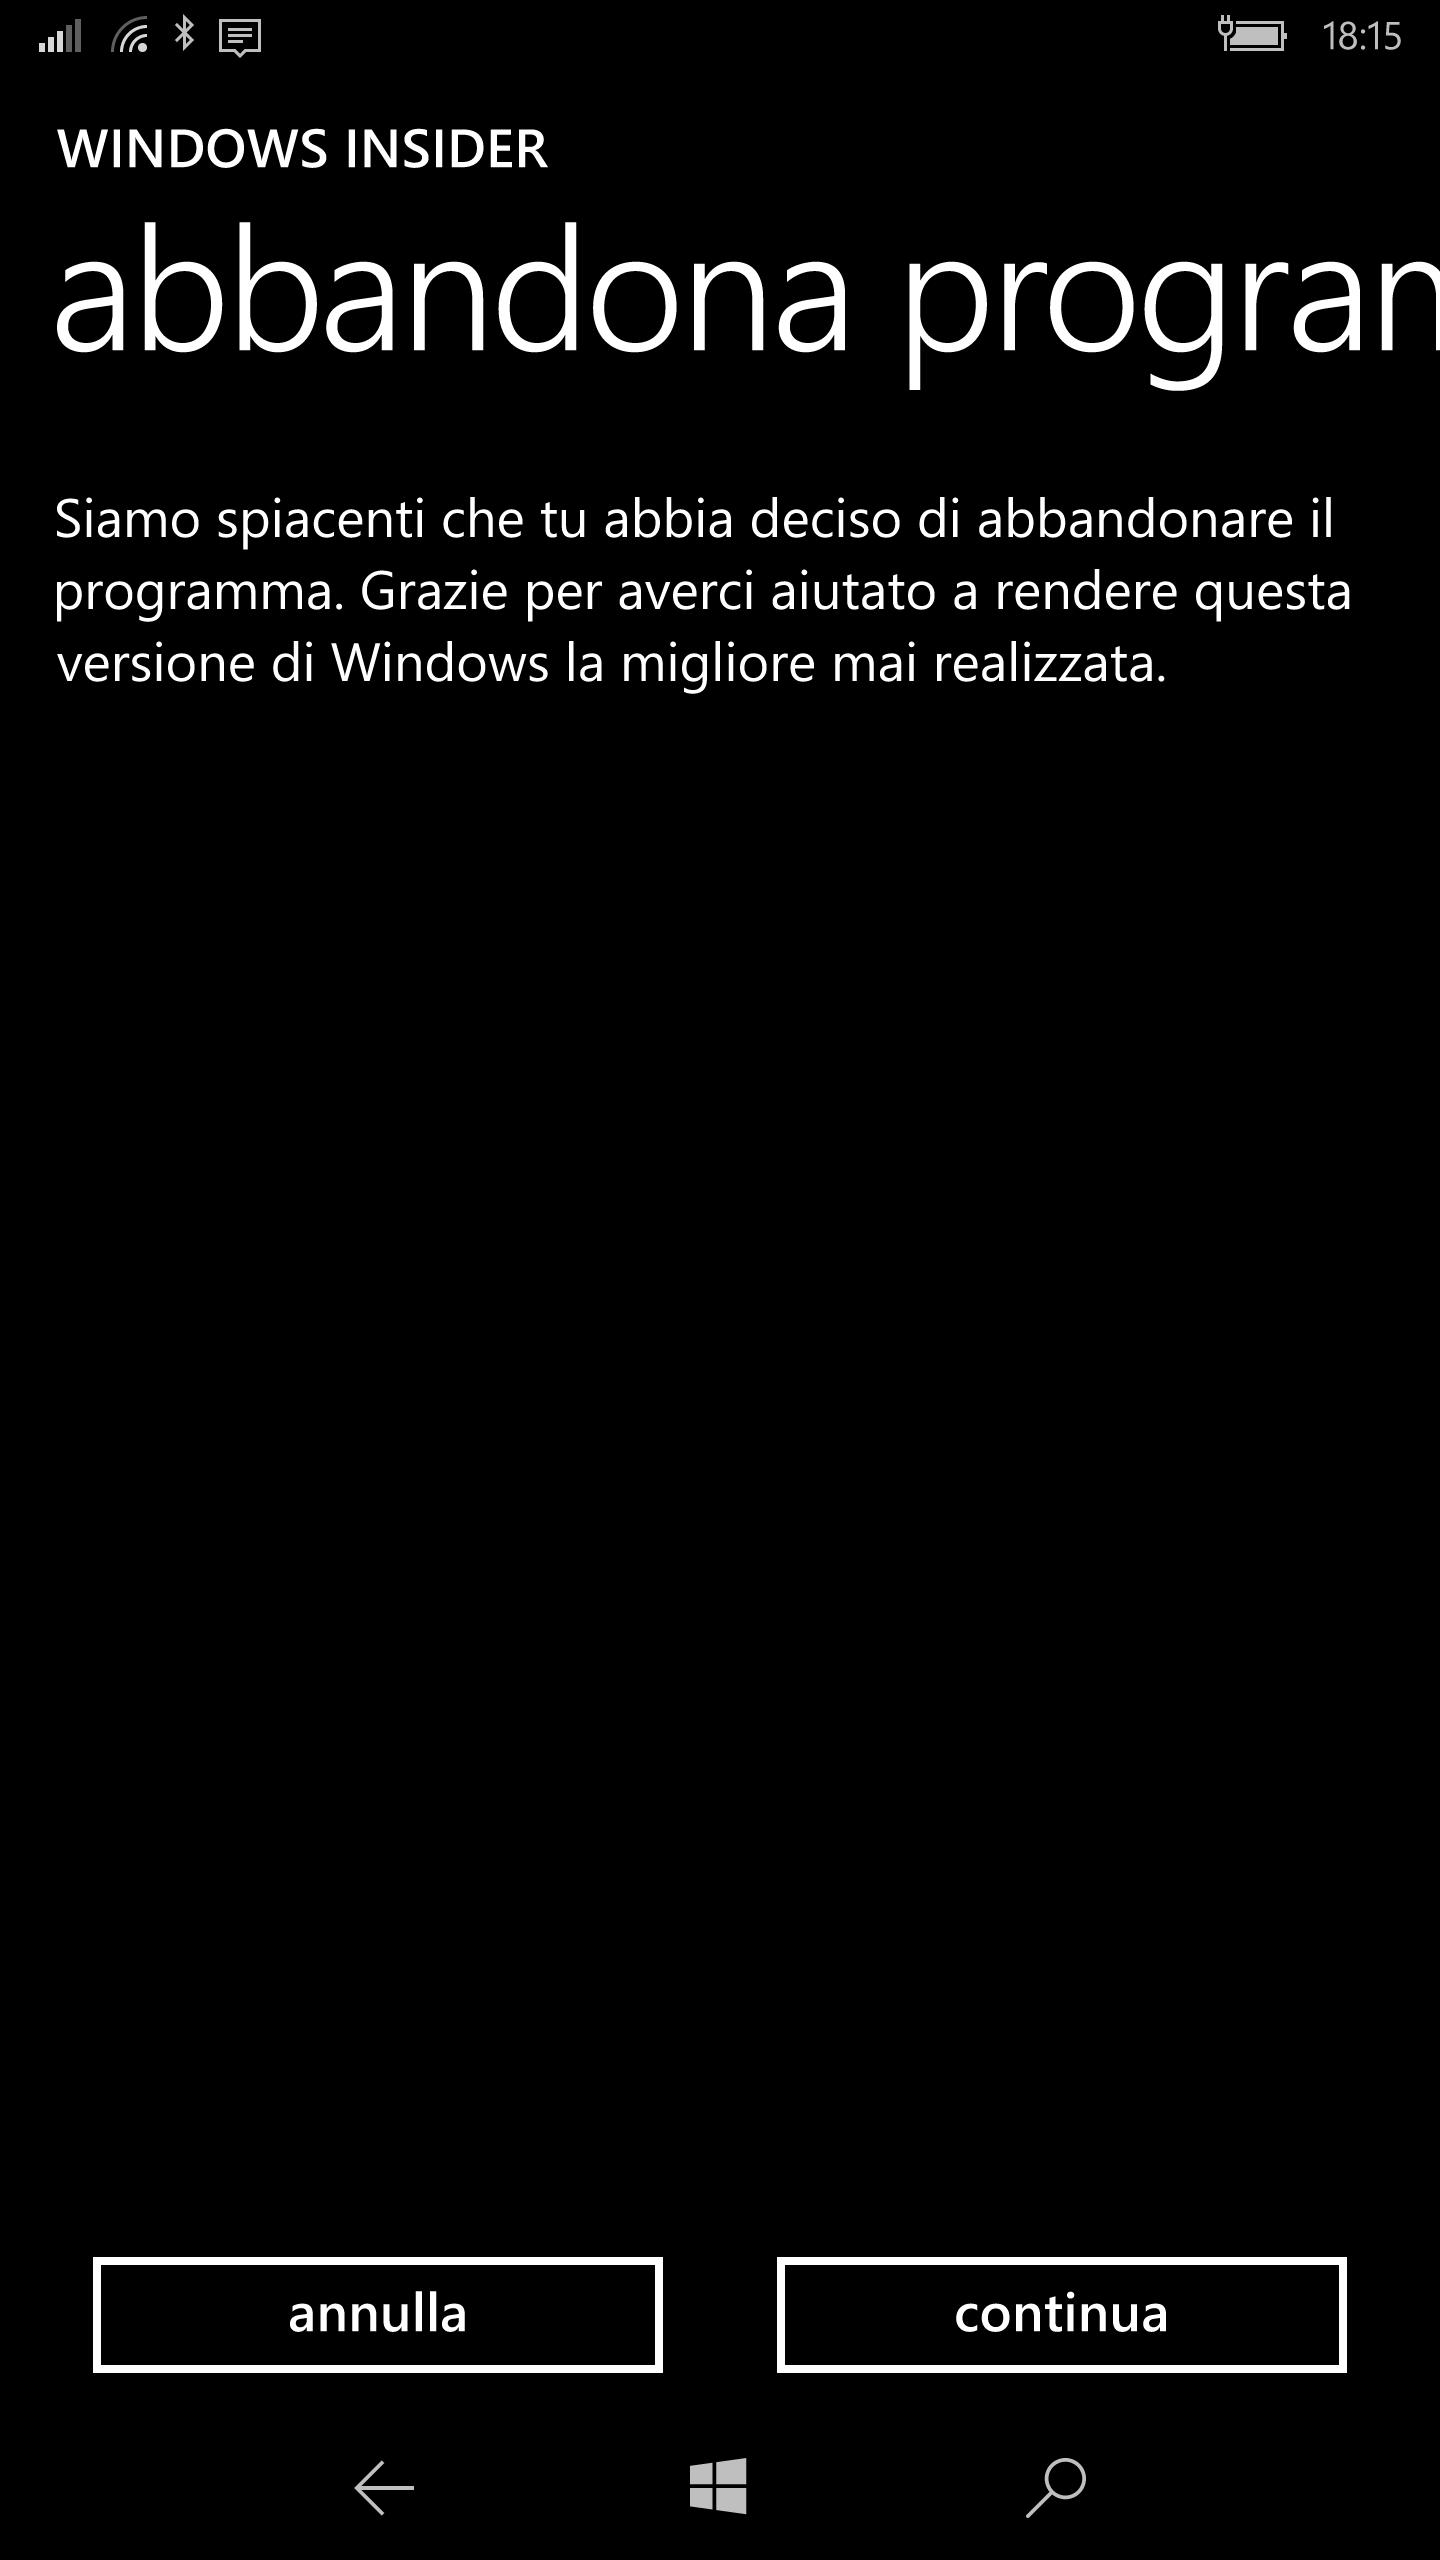 Windows Insider 3